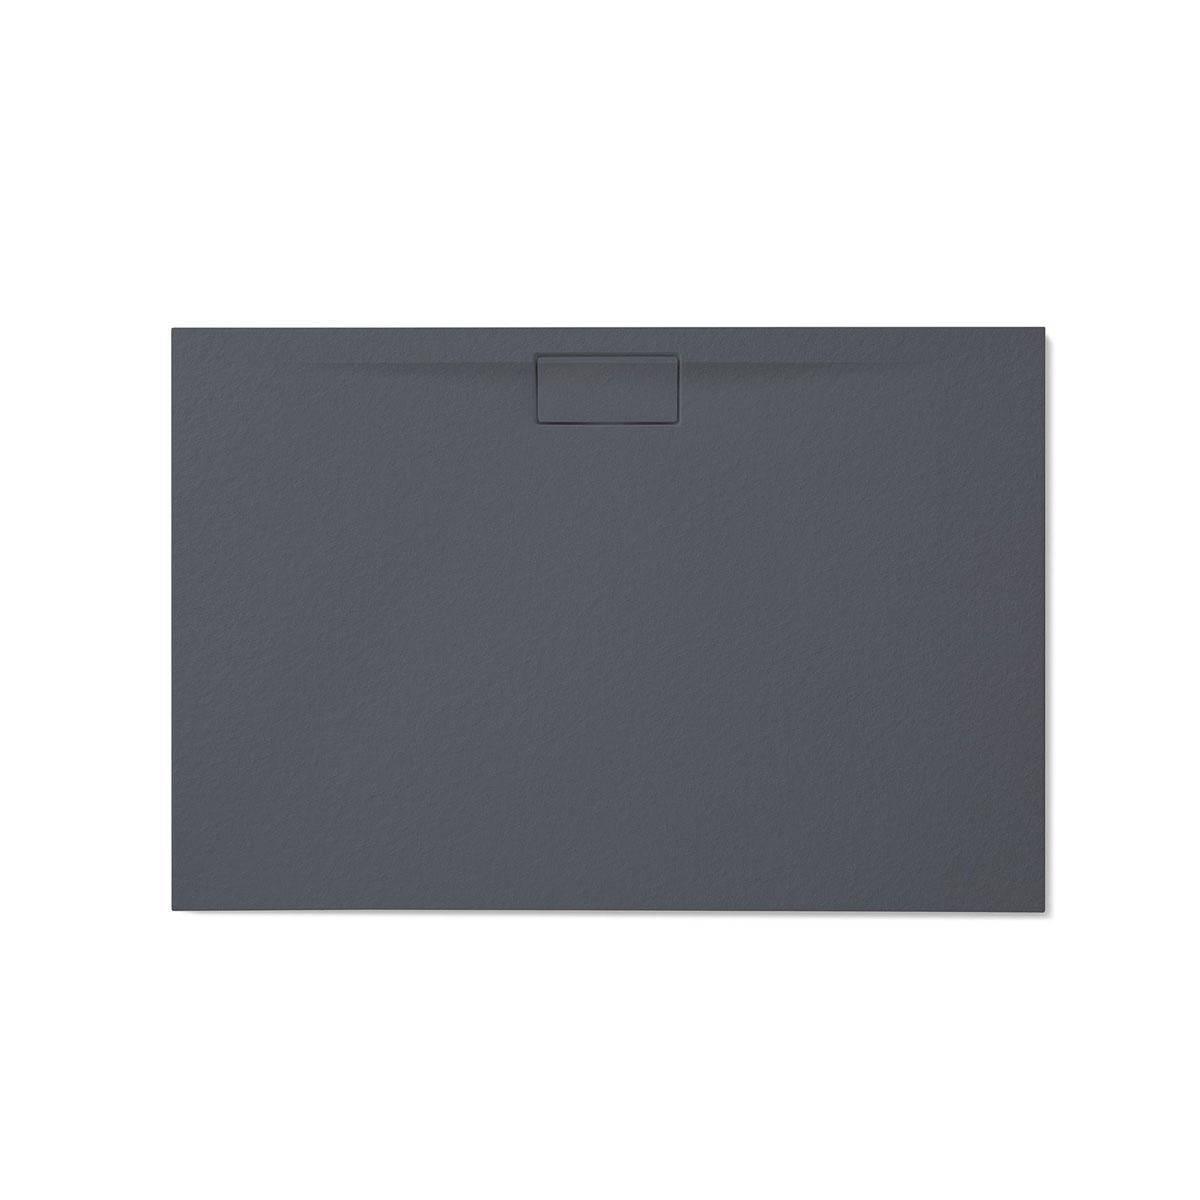 Plato de ducha rectangular 120x80 Nova Stone Cover Basalto